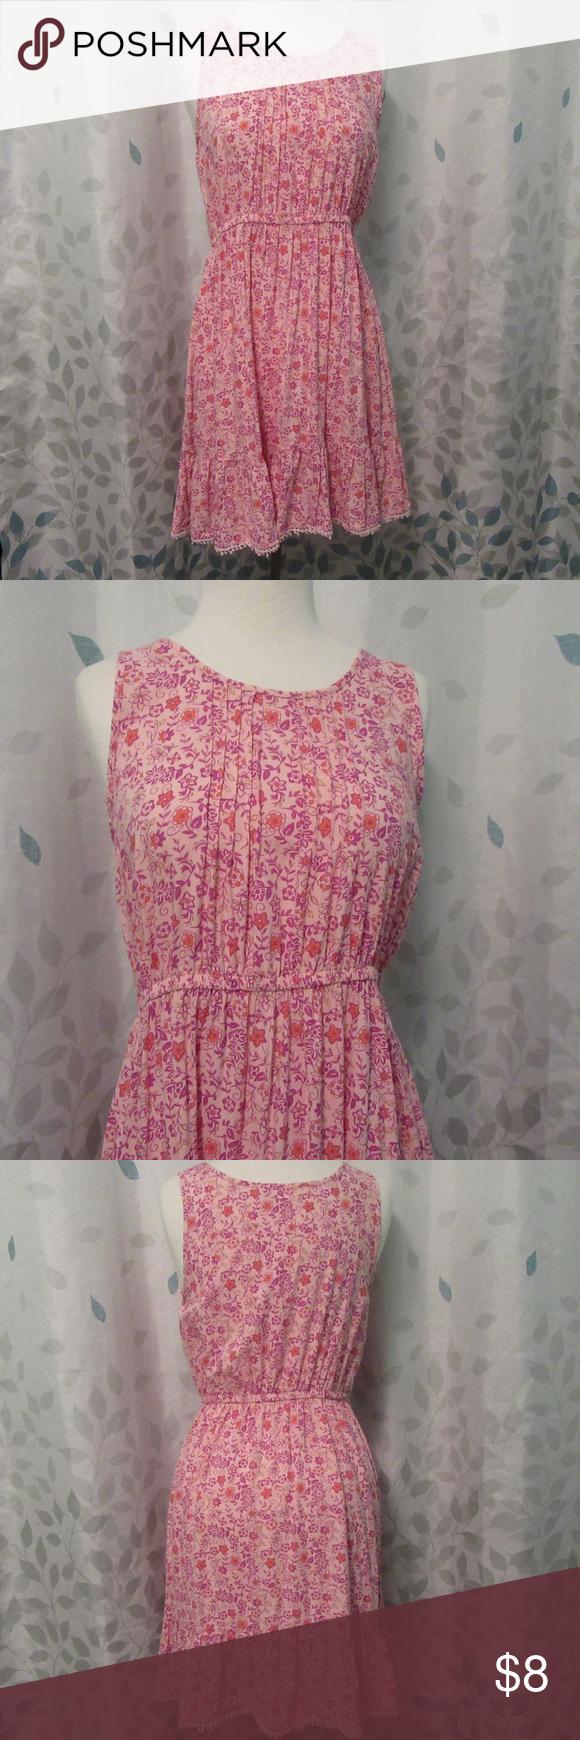 Mudd Brand Girls Summer Dress Size 16 Girls Dresses Summer Summer Dresses Size 16 Dresses [ 1740 x 580 Pixel ]